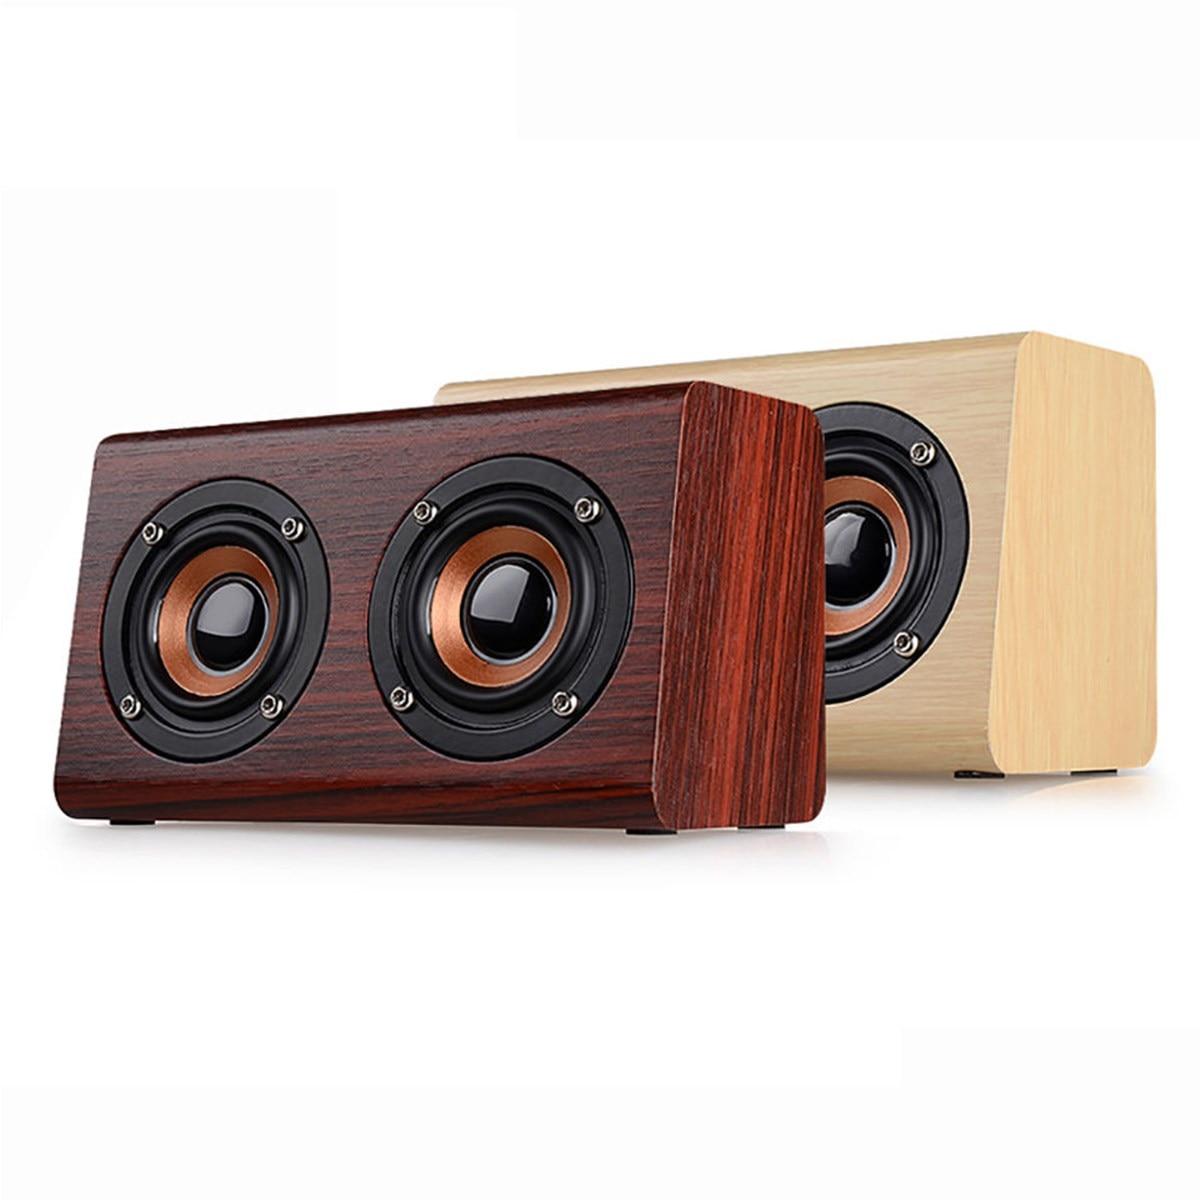 W7 Portable Wireless Bluetooth Speaker 1500mAh Subwoofer 3.5mm Retro Wood Dual Loudspeaker USB Charging Speaker